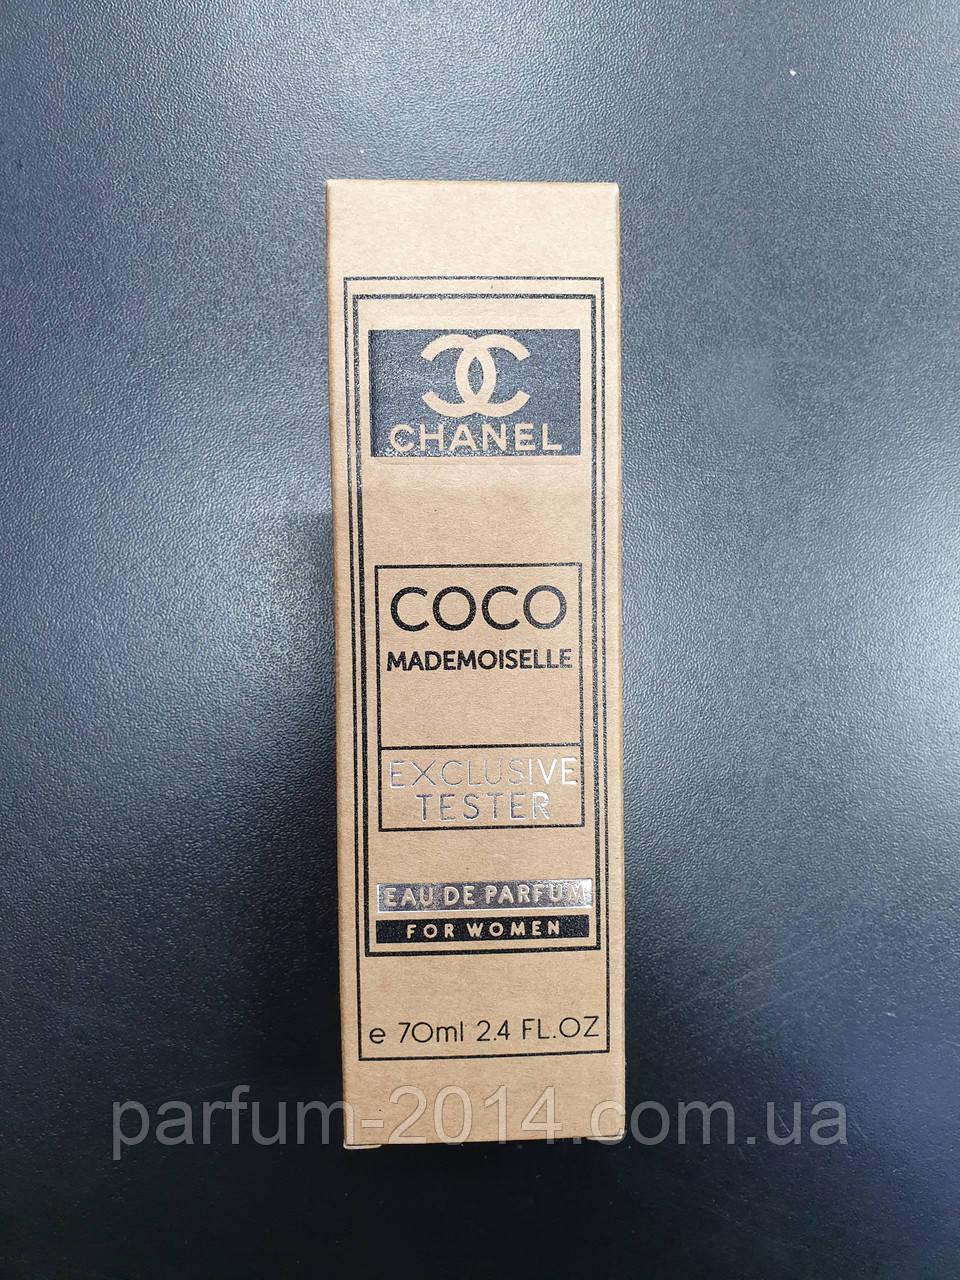 Эксклюзивный тестер Chanel Coco Mademoiselle 70 мл ОАЭ (реплика)